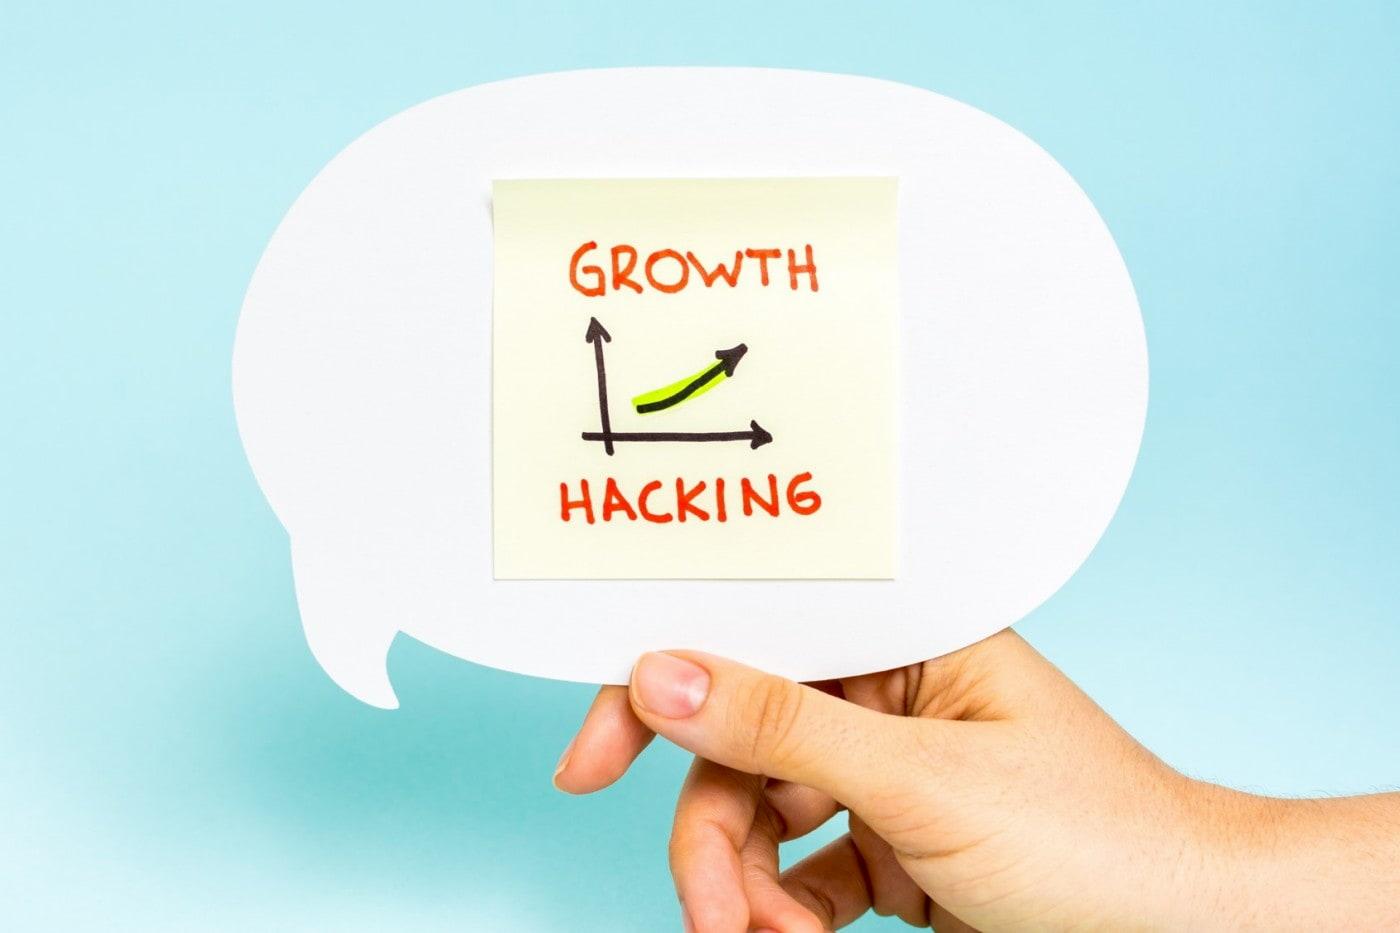 Growth Hacking - Hacking de Crescimento, entenda essa estratégia